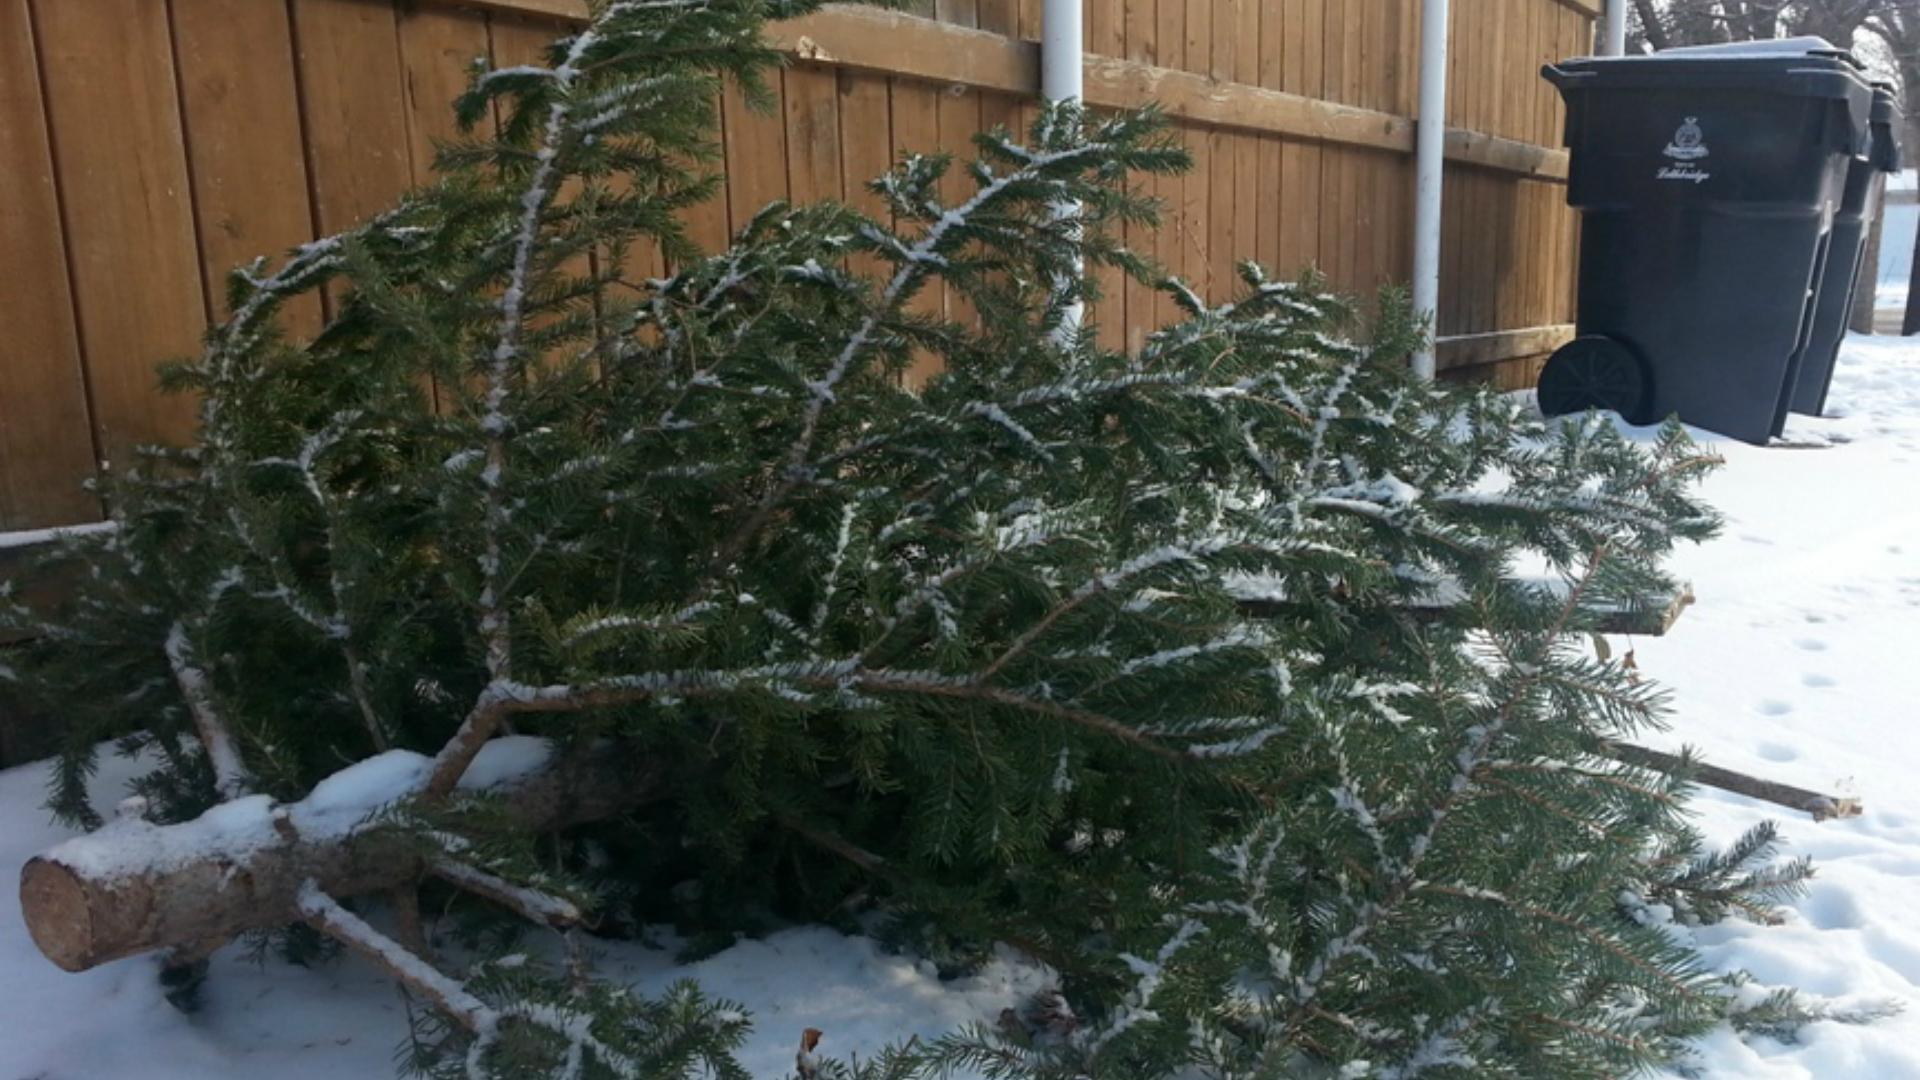 Christmas Tree Pick Up.Christmas Tree Pickup Set For Saturday Lethbridgenewsnow